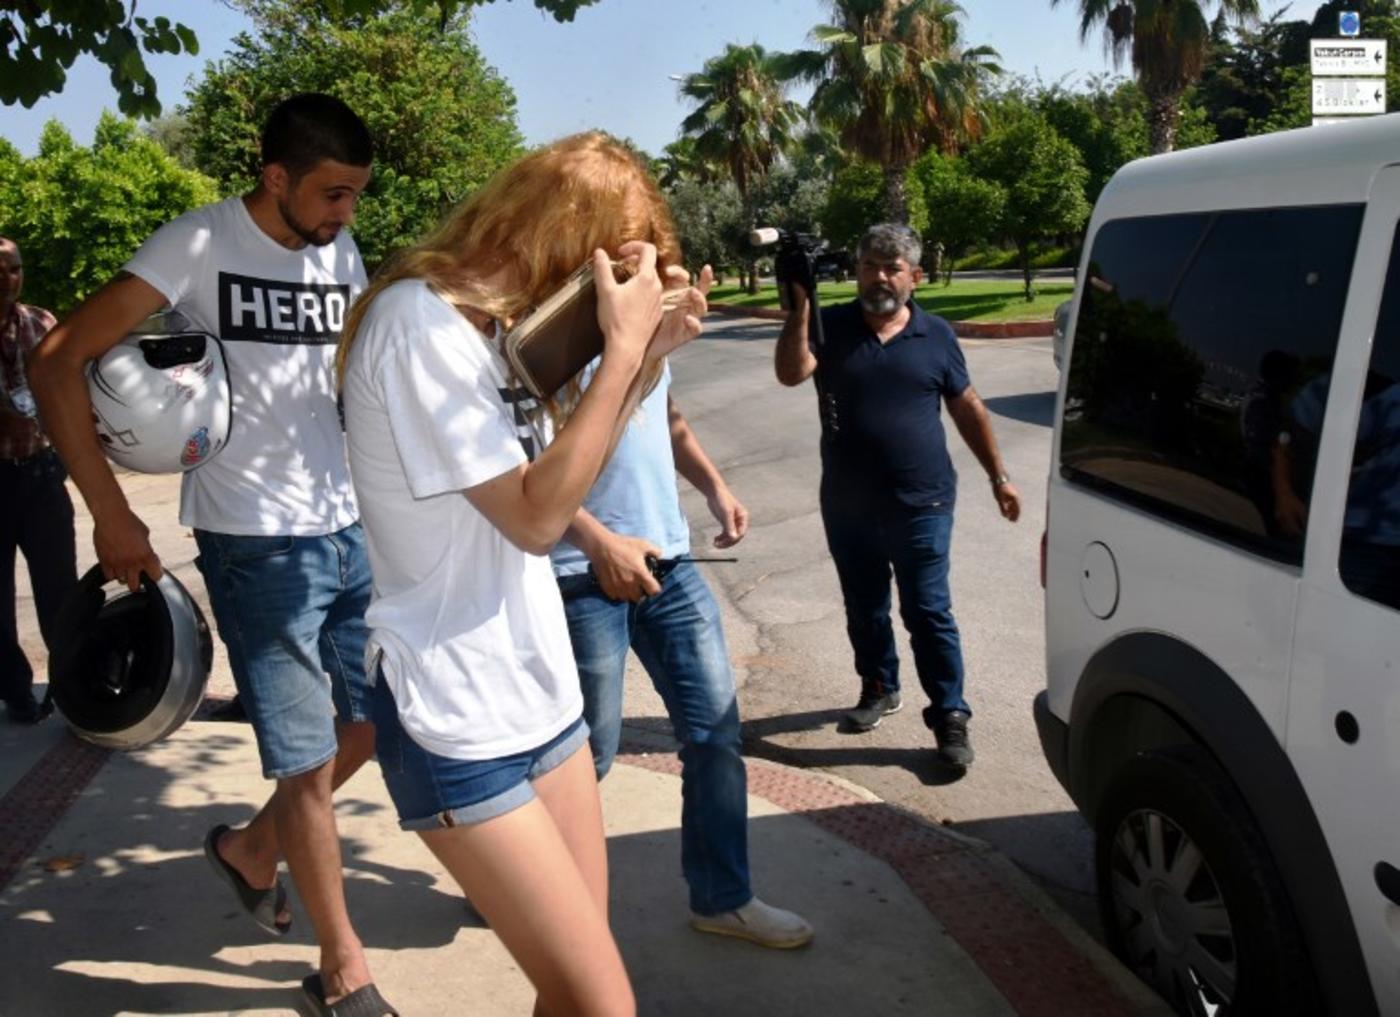 What not to wear: Turkish 'hero' T-shirts land dozens in